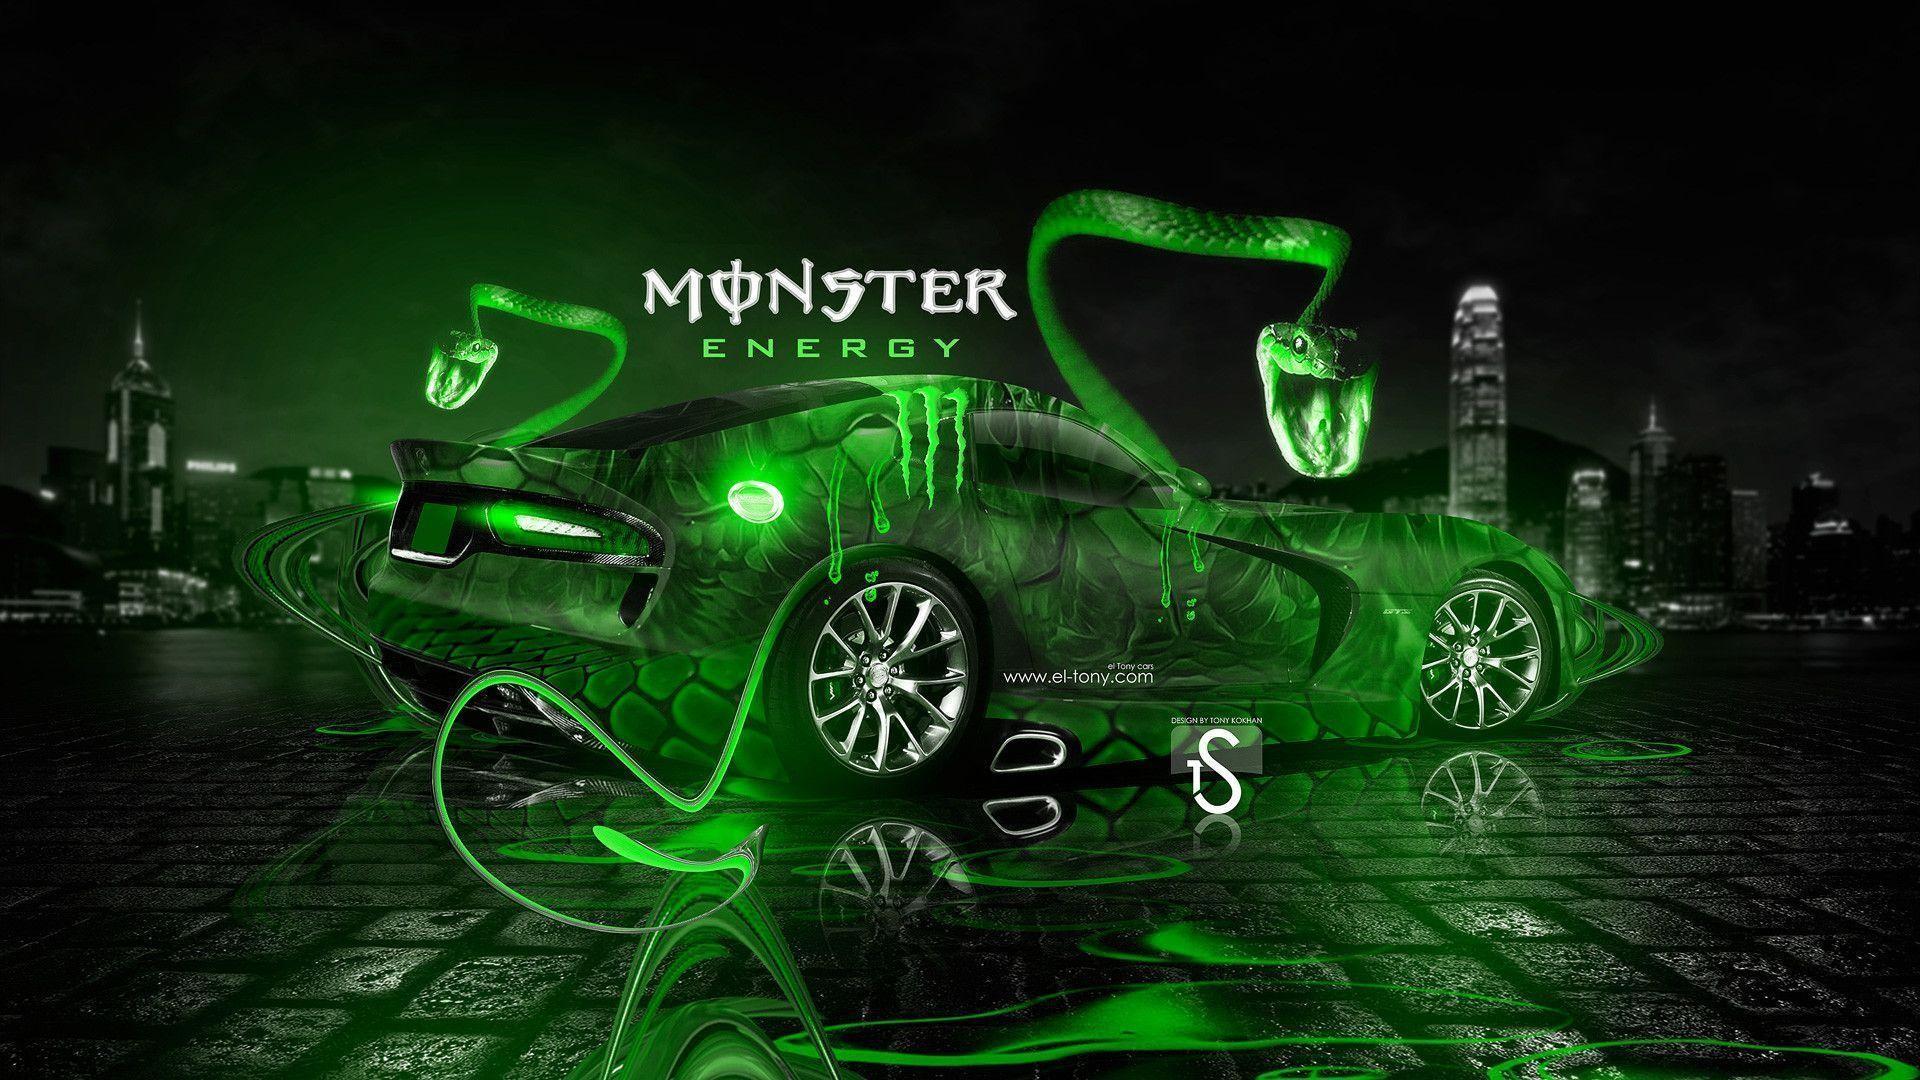 monster army logo wallpaper enam wallpaper